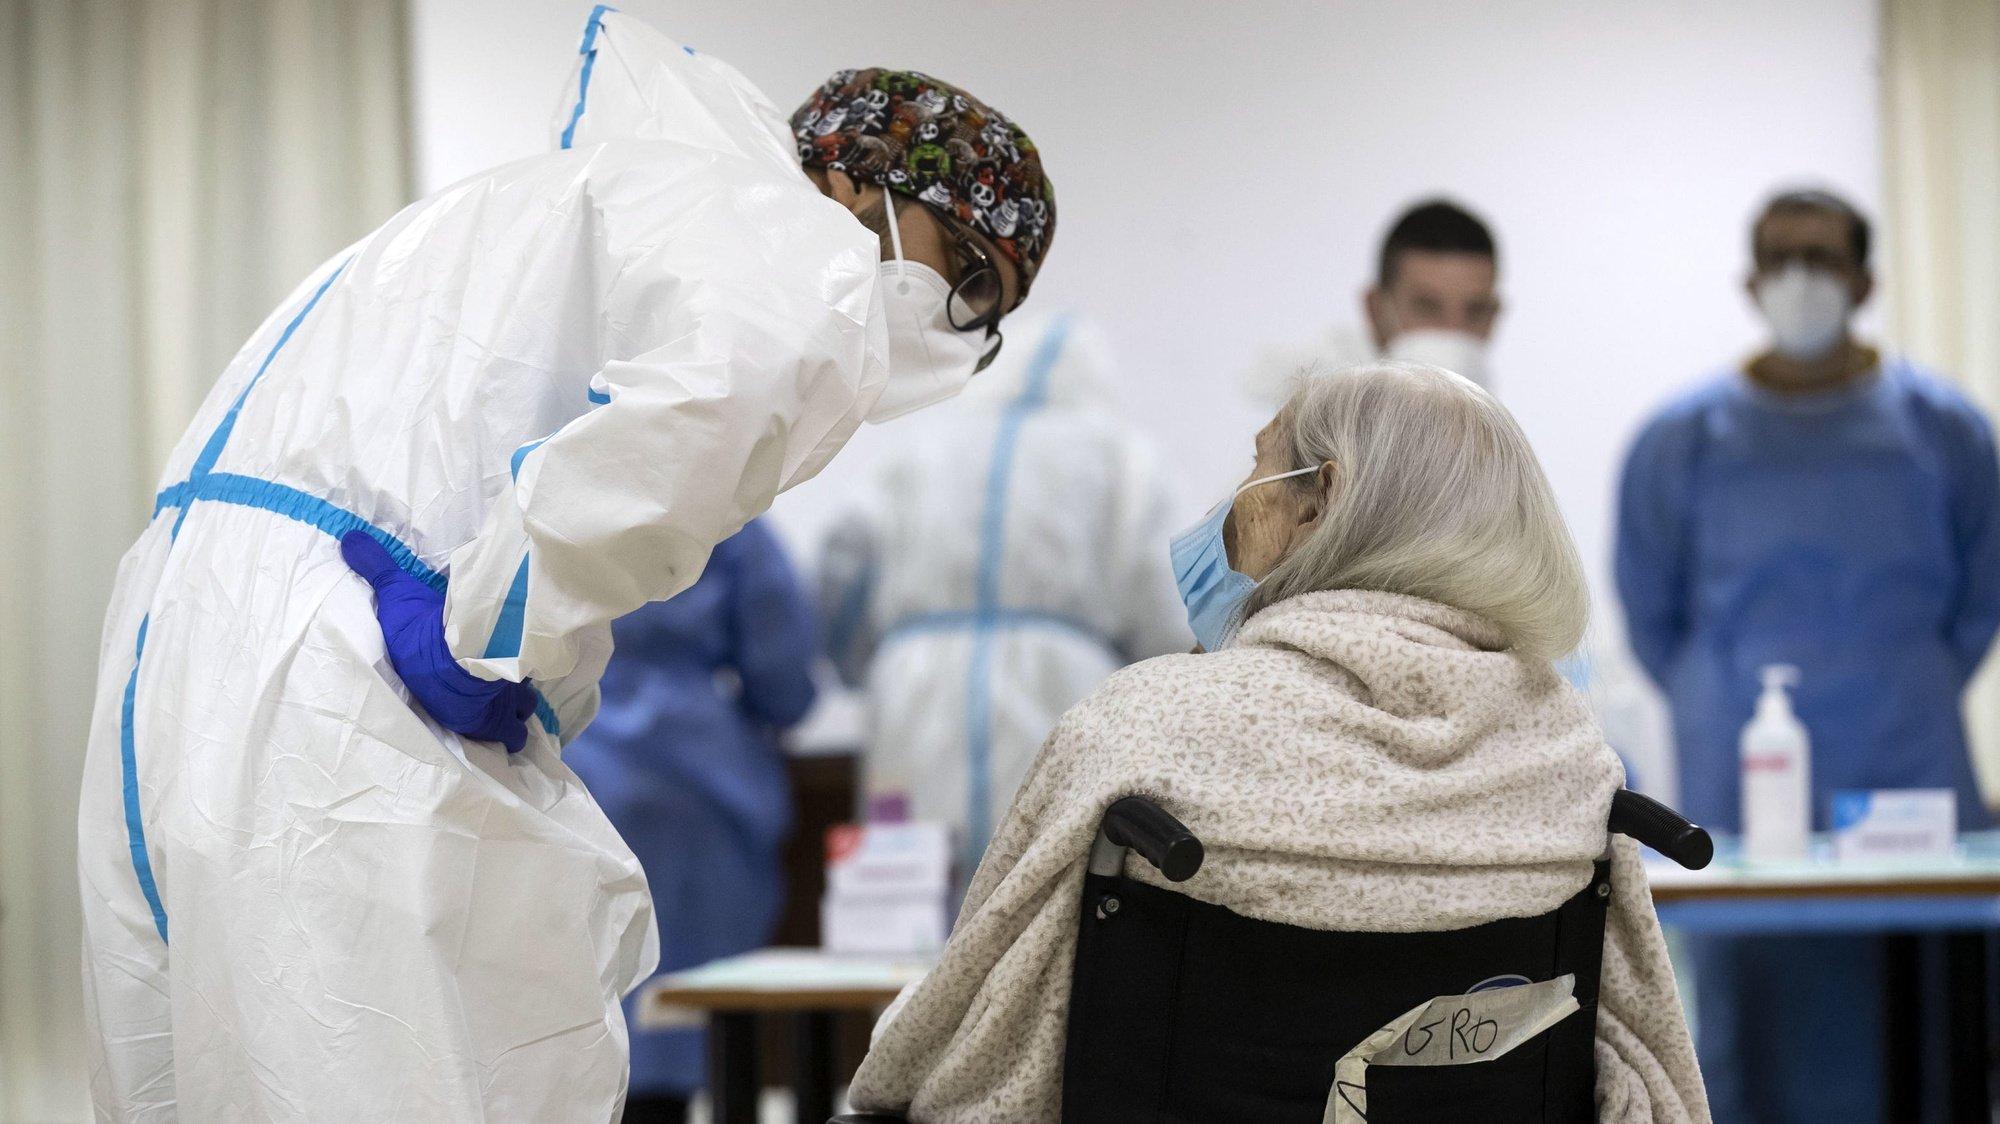 epa08926584 Vaccination against Covid-19 at 'Anni Azzurri' nursing home in Rome, Italy, 08 January 2021.  EPA/ANSA/MASSIMO PERCOSSI